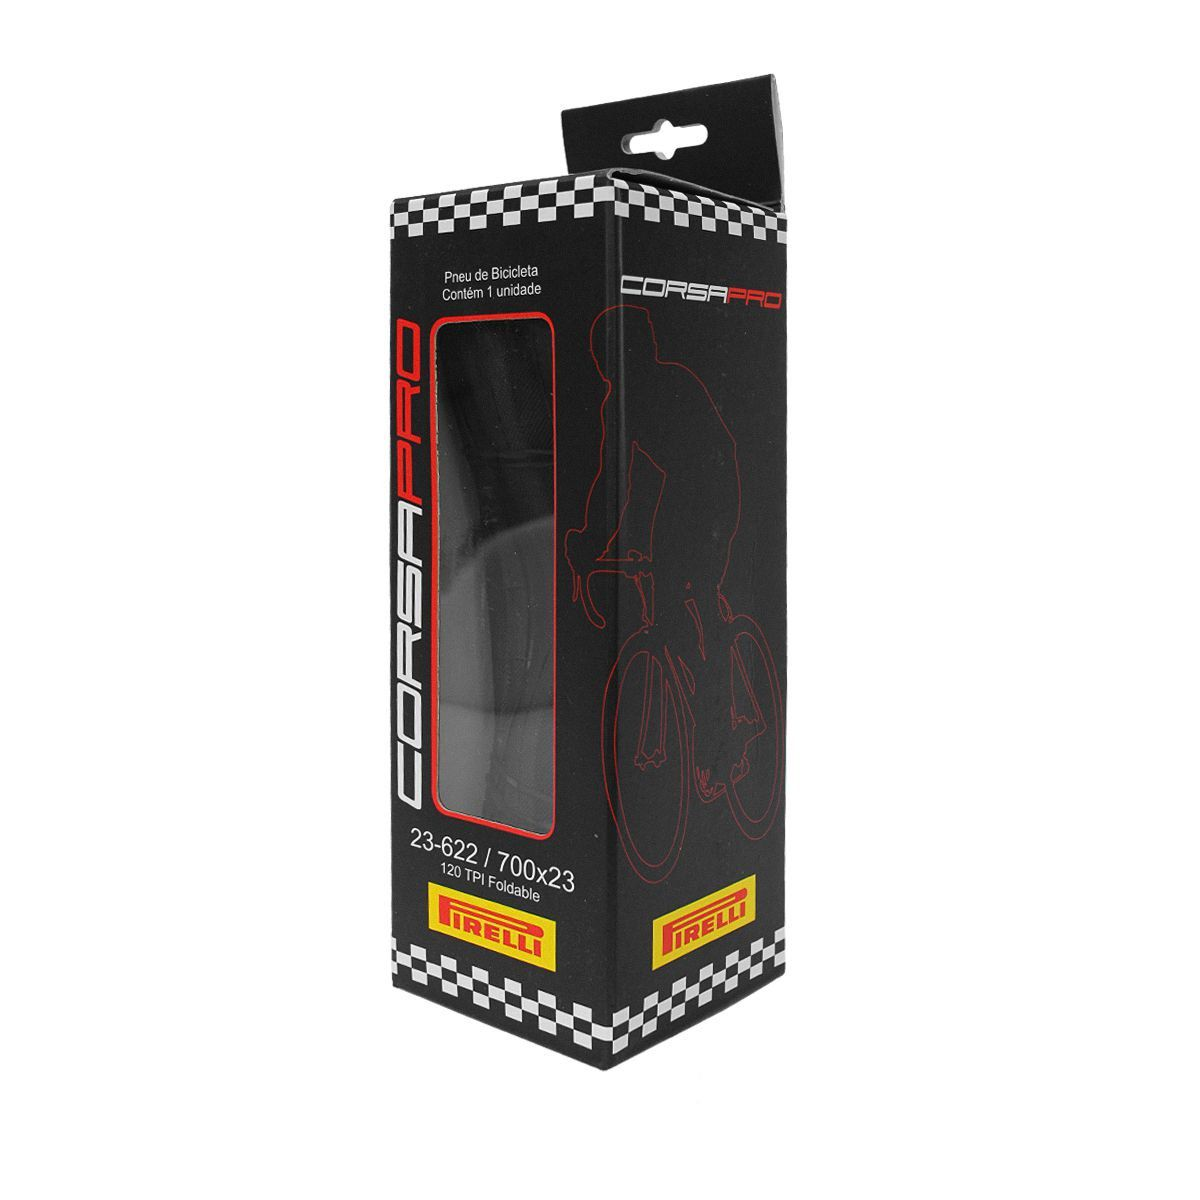 Pneu Pirelli Corsa Pro - 700 X 23 Preto